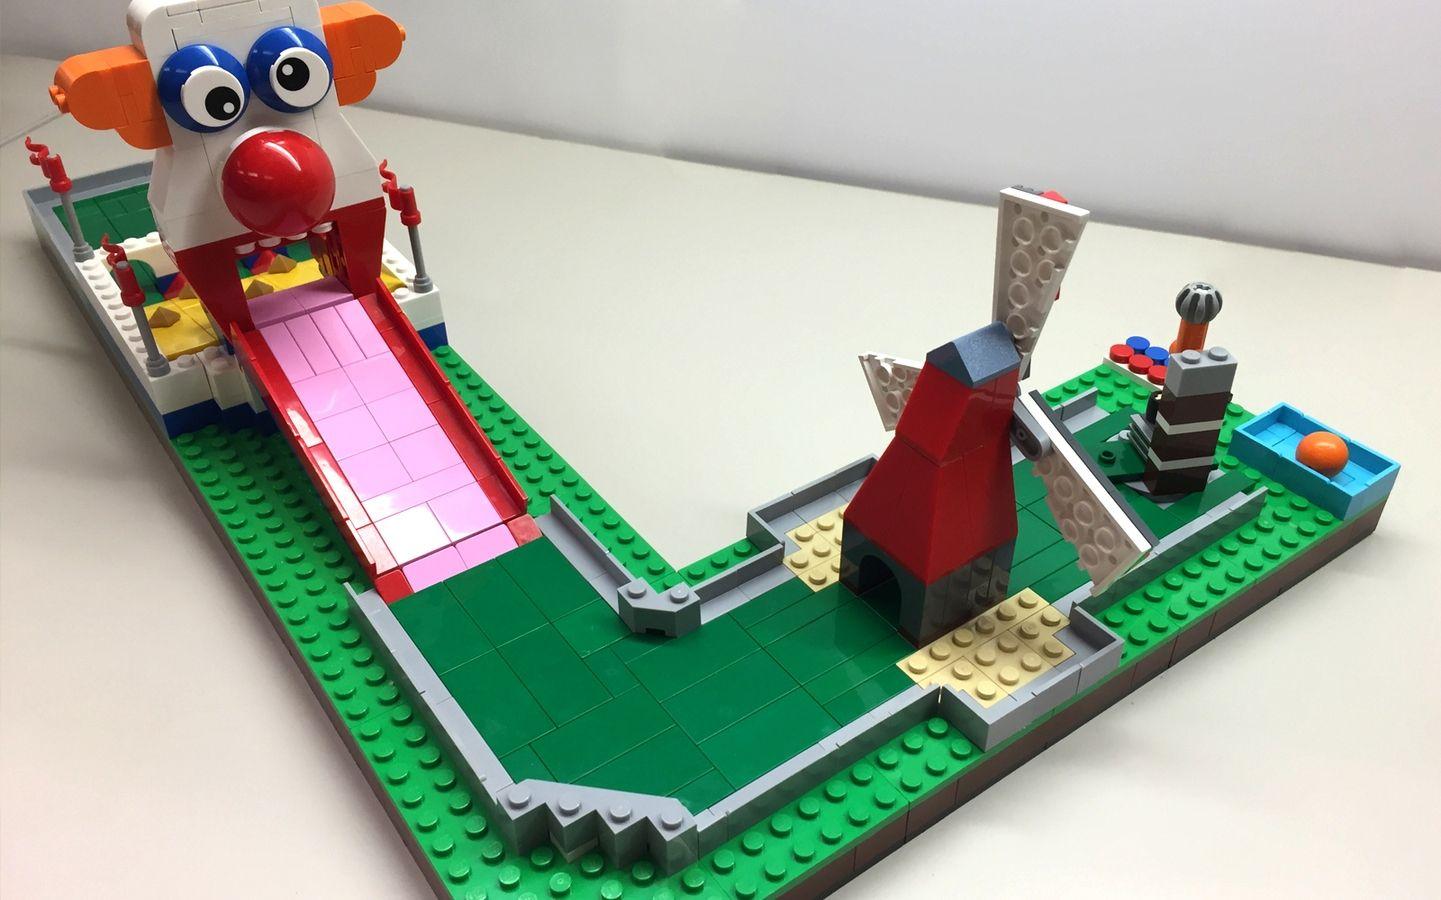 Lego mini golf lego challenge cool lego creations lego